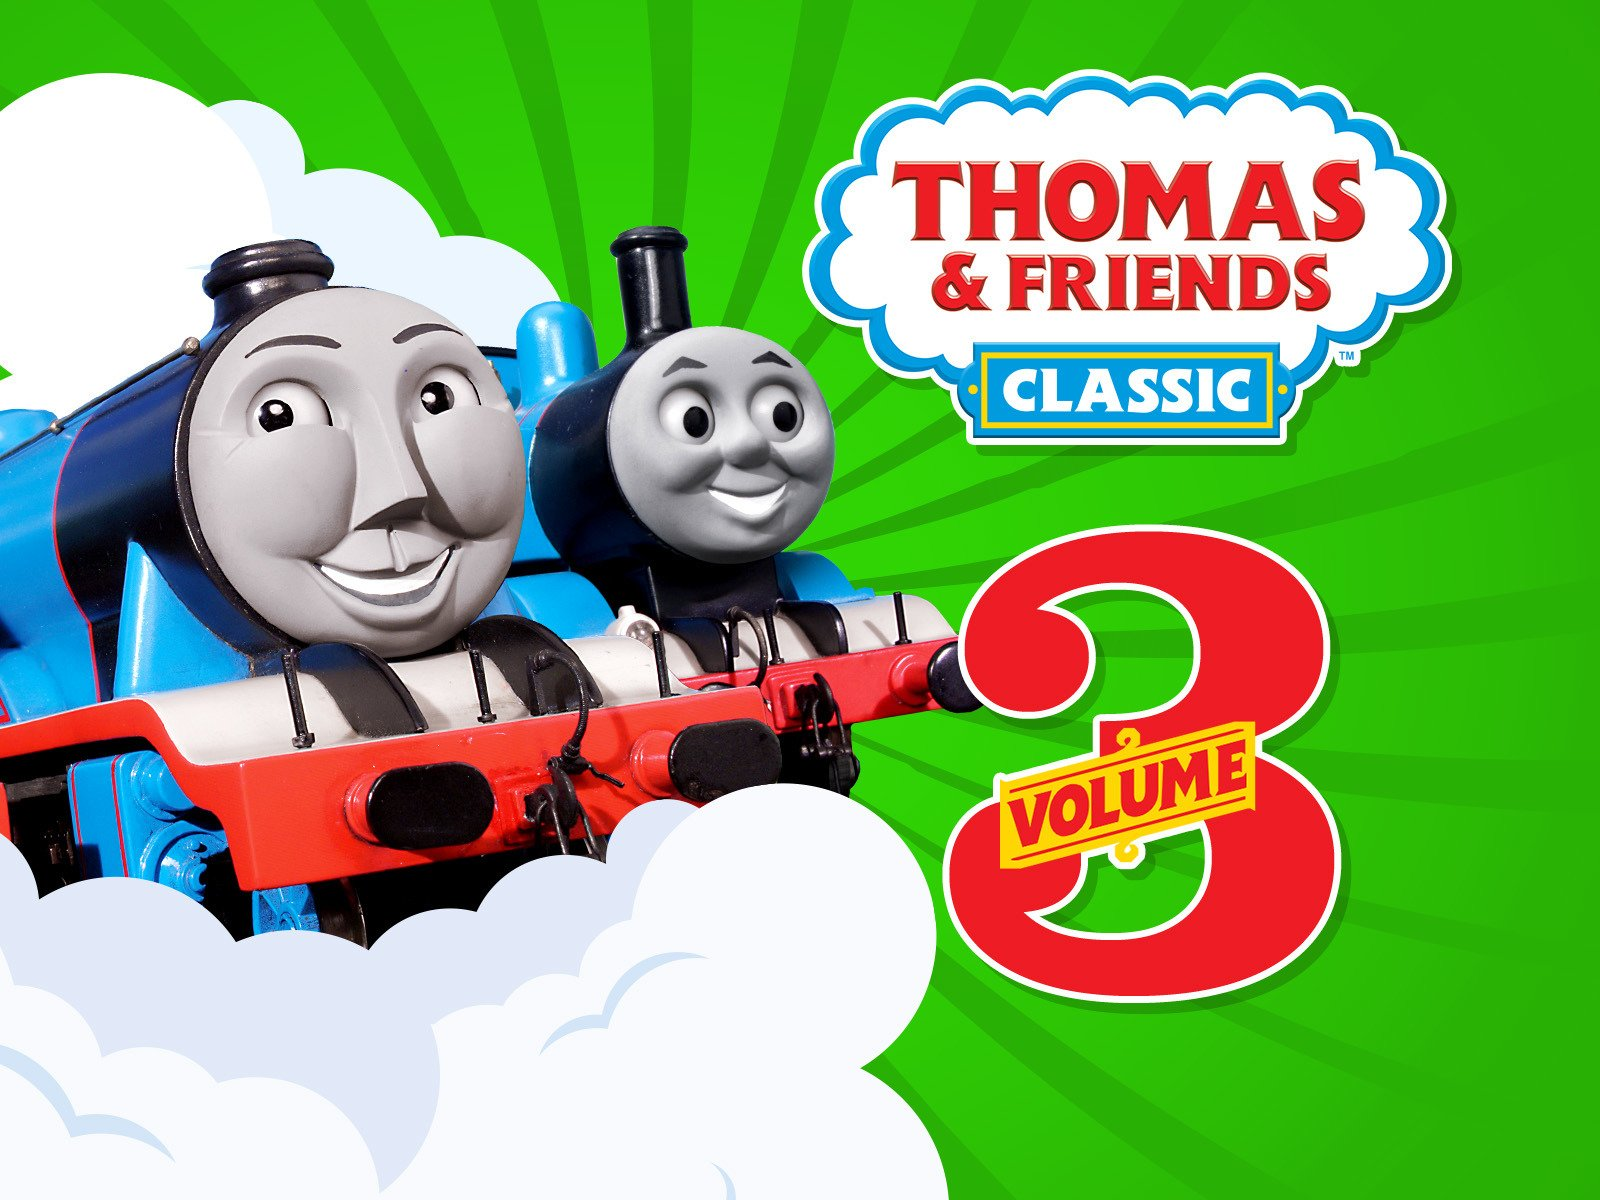 Thomas & Friends Classic Volume 3